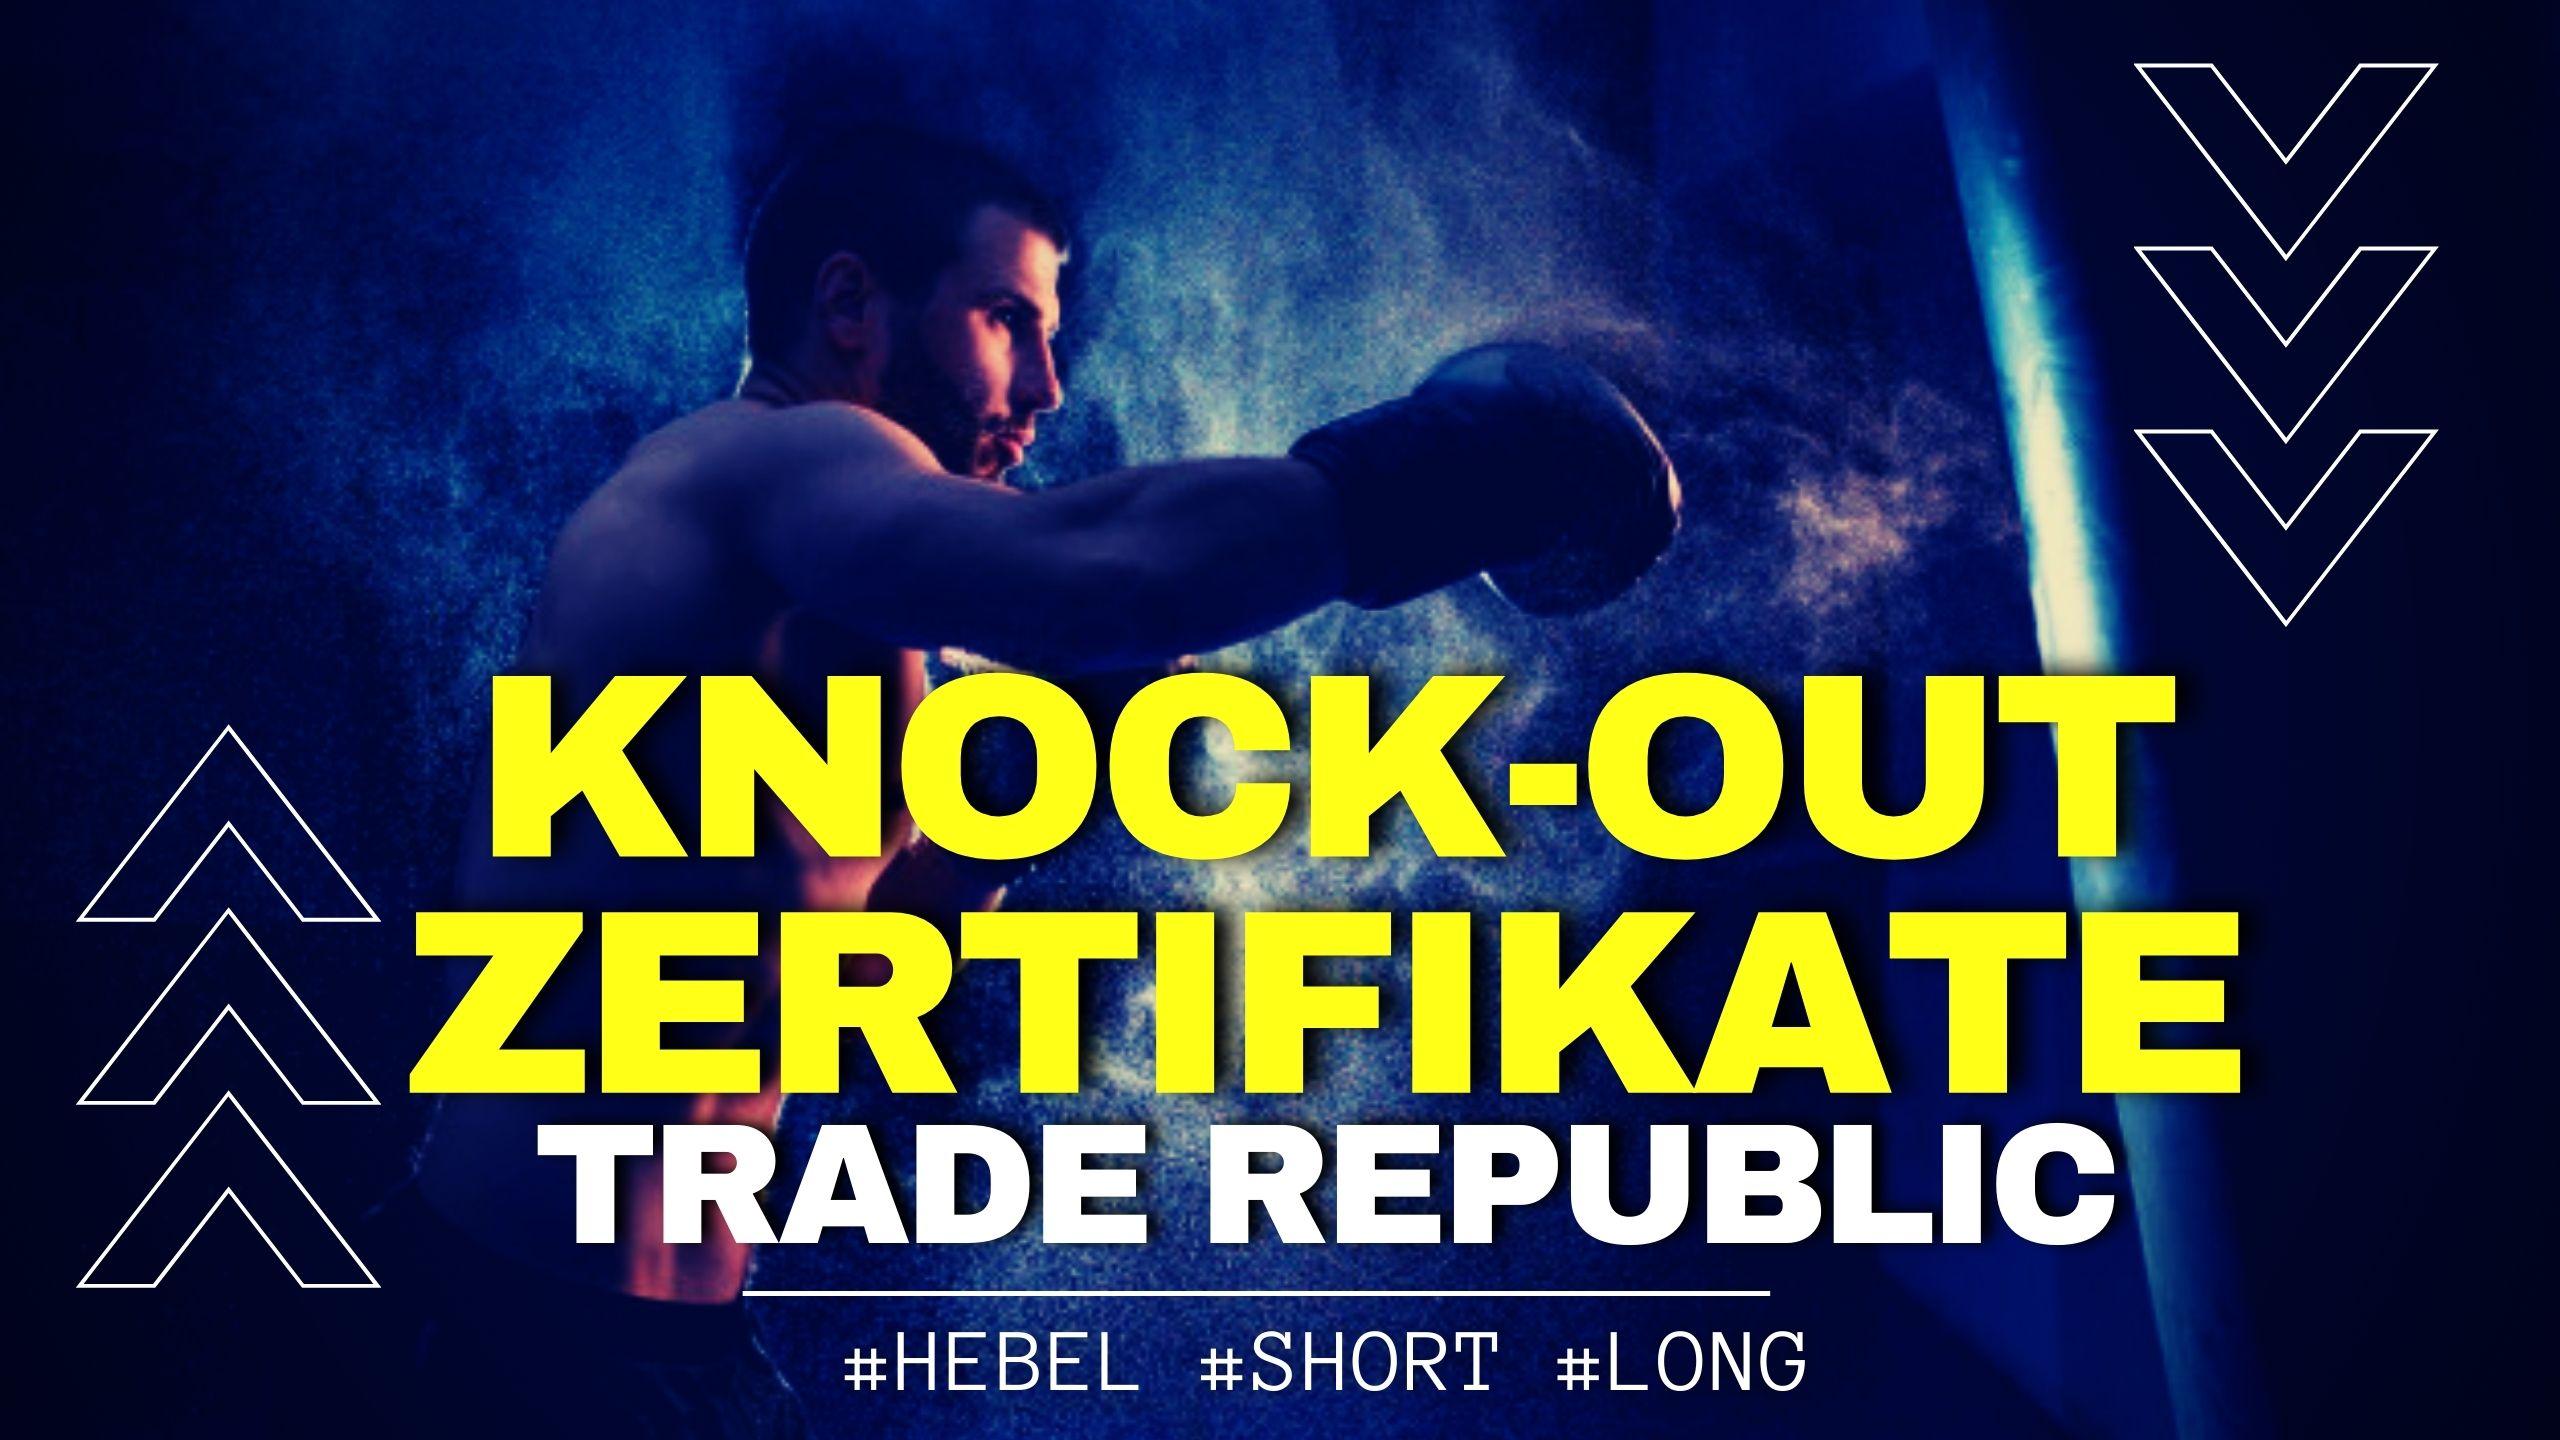 Knock Out Zertifikate Trade Republic